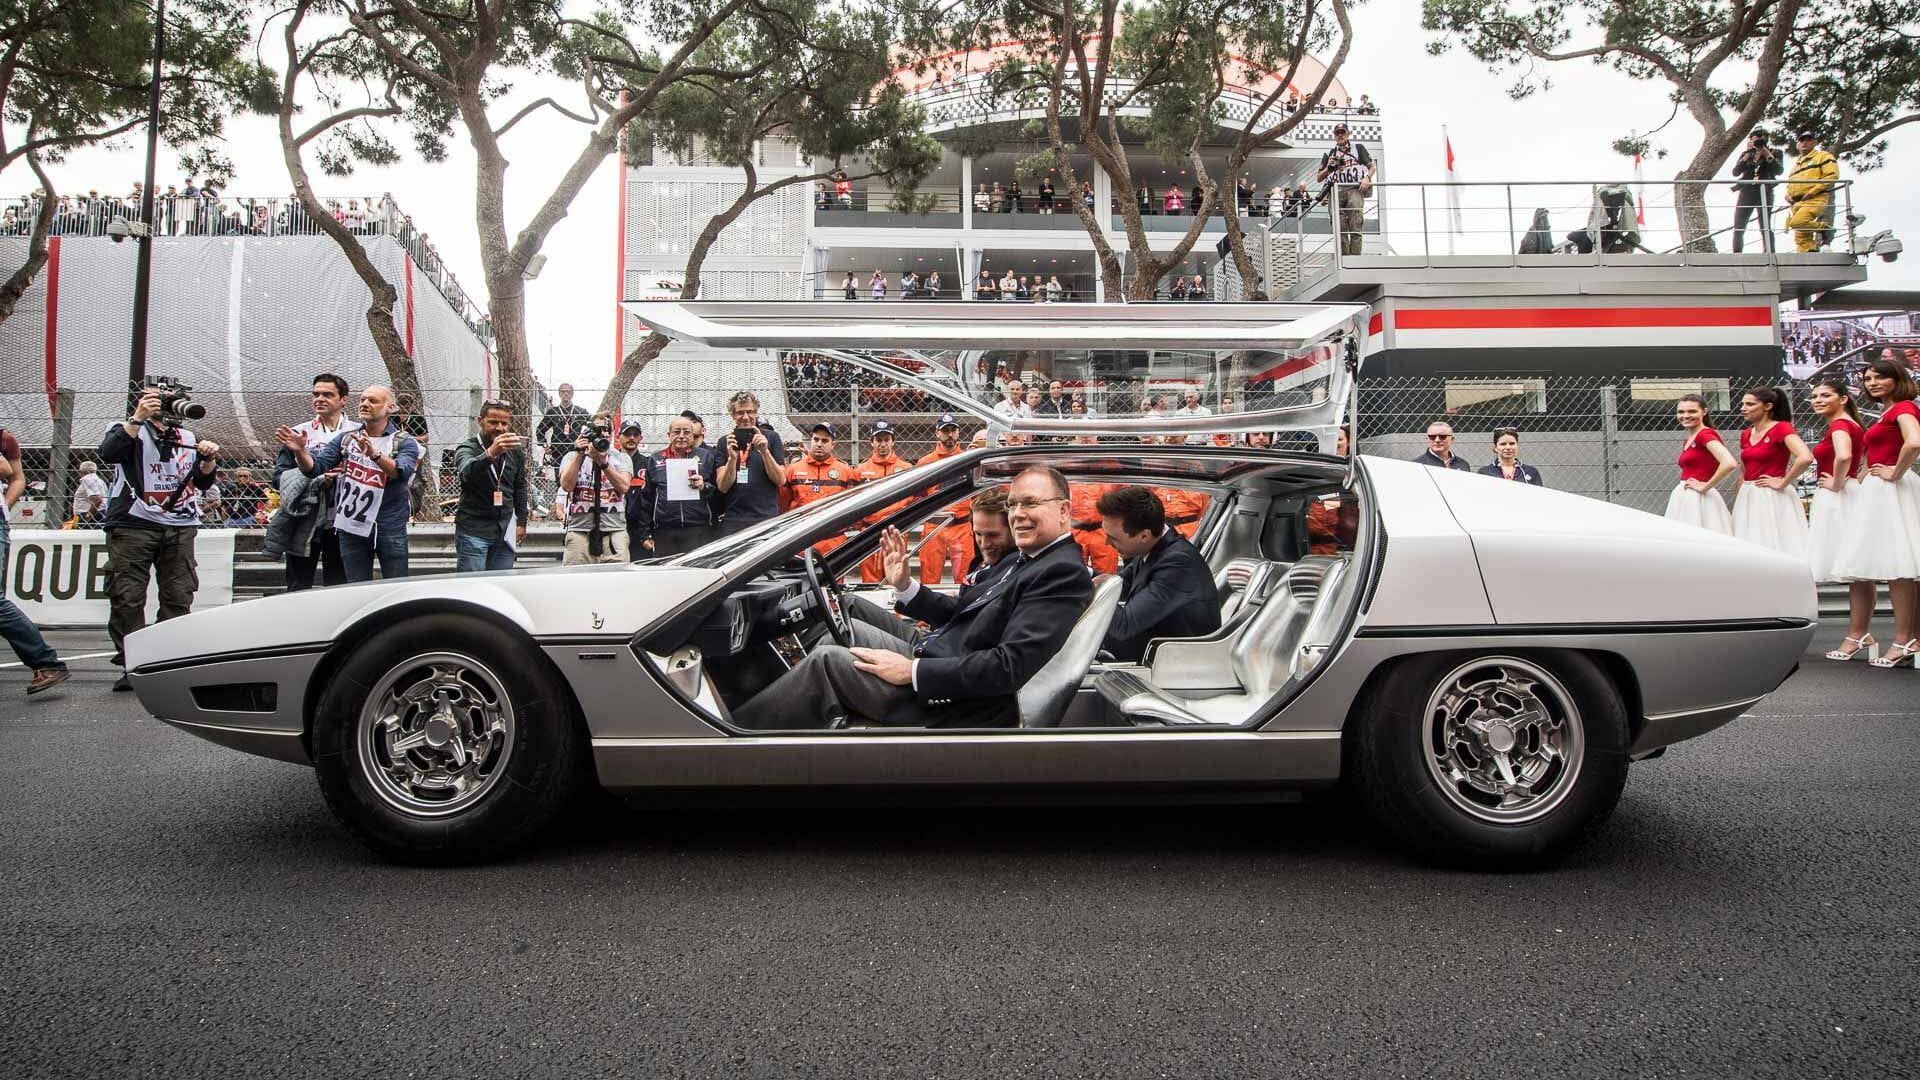 Prince Albert II drives a 1967 Lamborghini Marzal